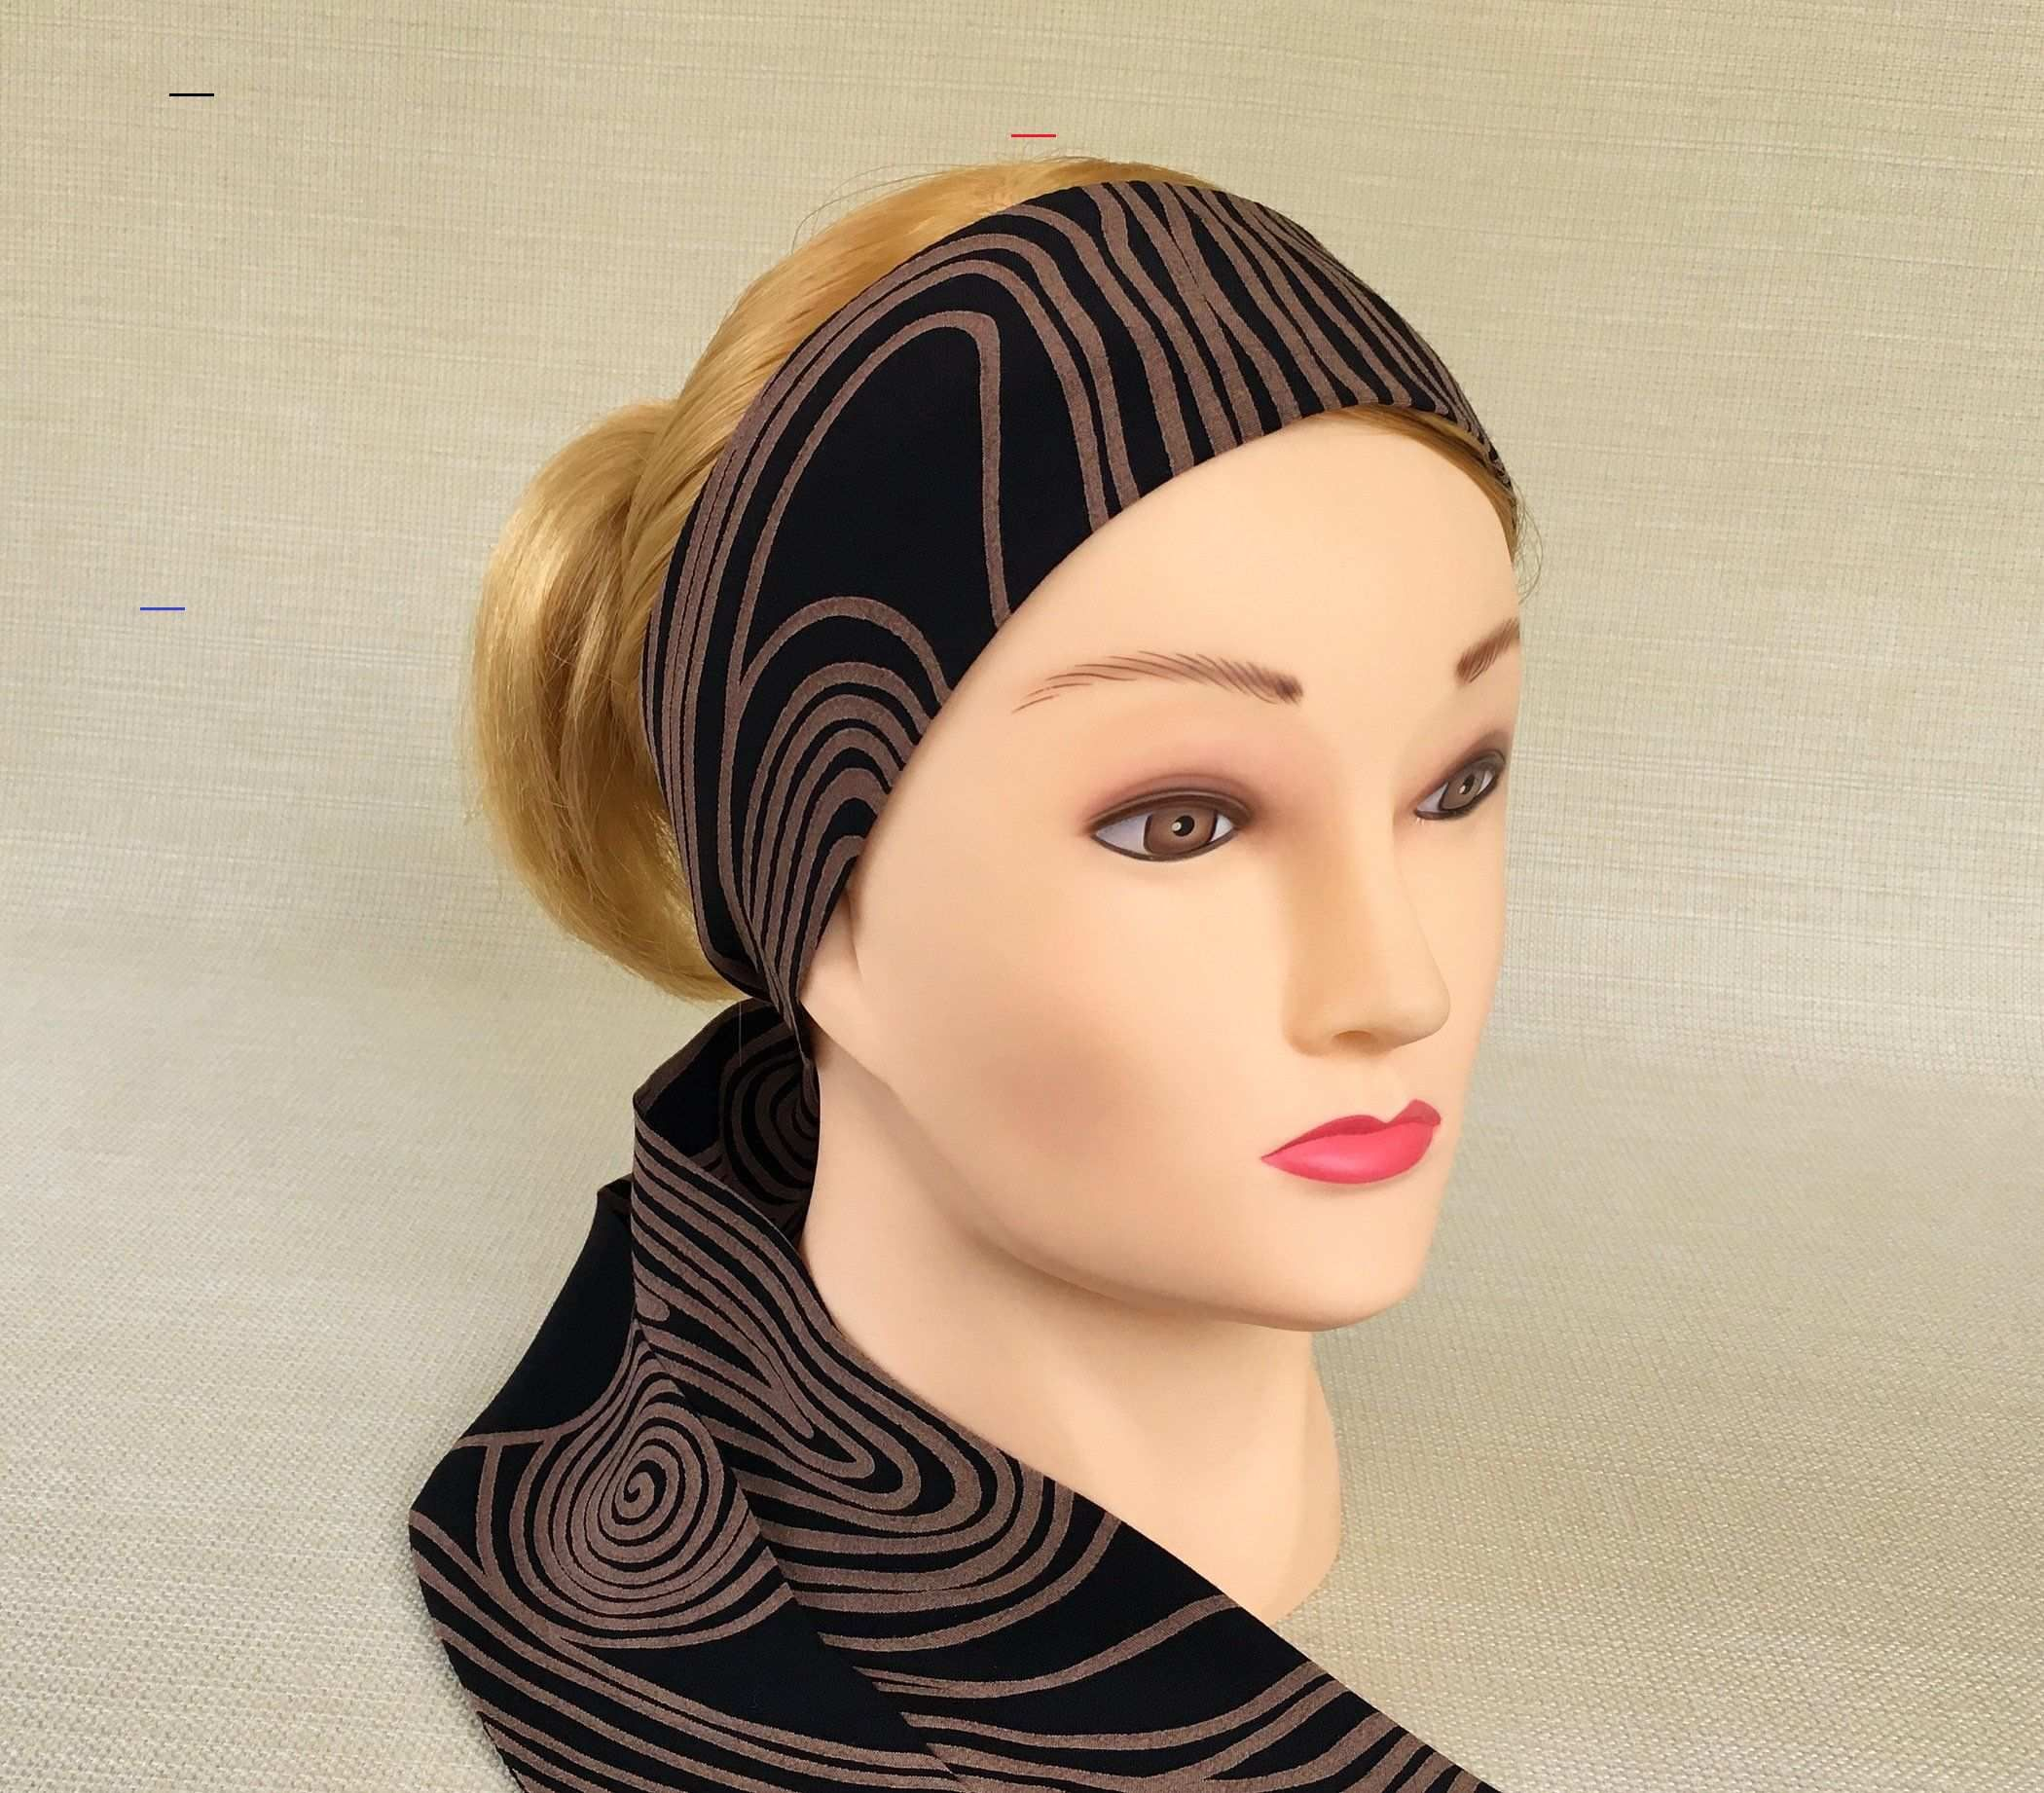 KYLIE HEADWRAP HEADBAND ELASTICATED HEAD WRAP STRETCHY BANDANA CAP 3 IN 1 NEW